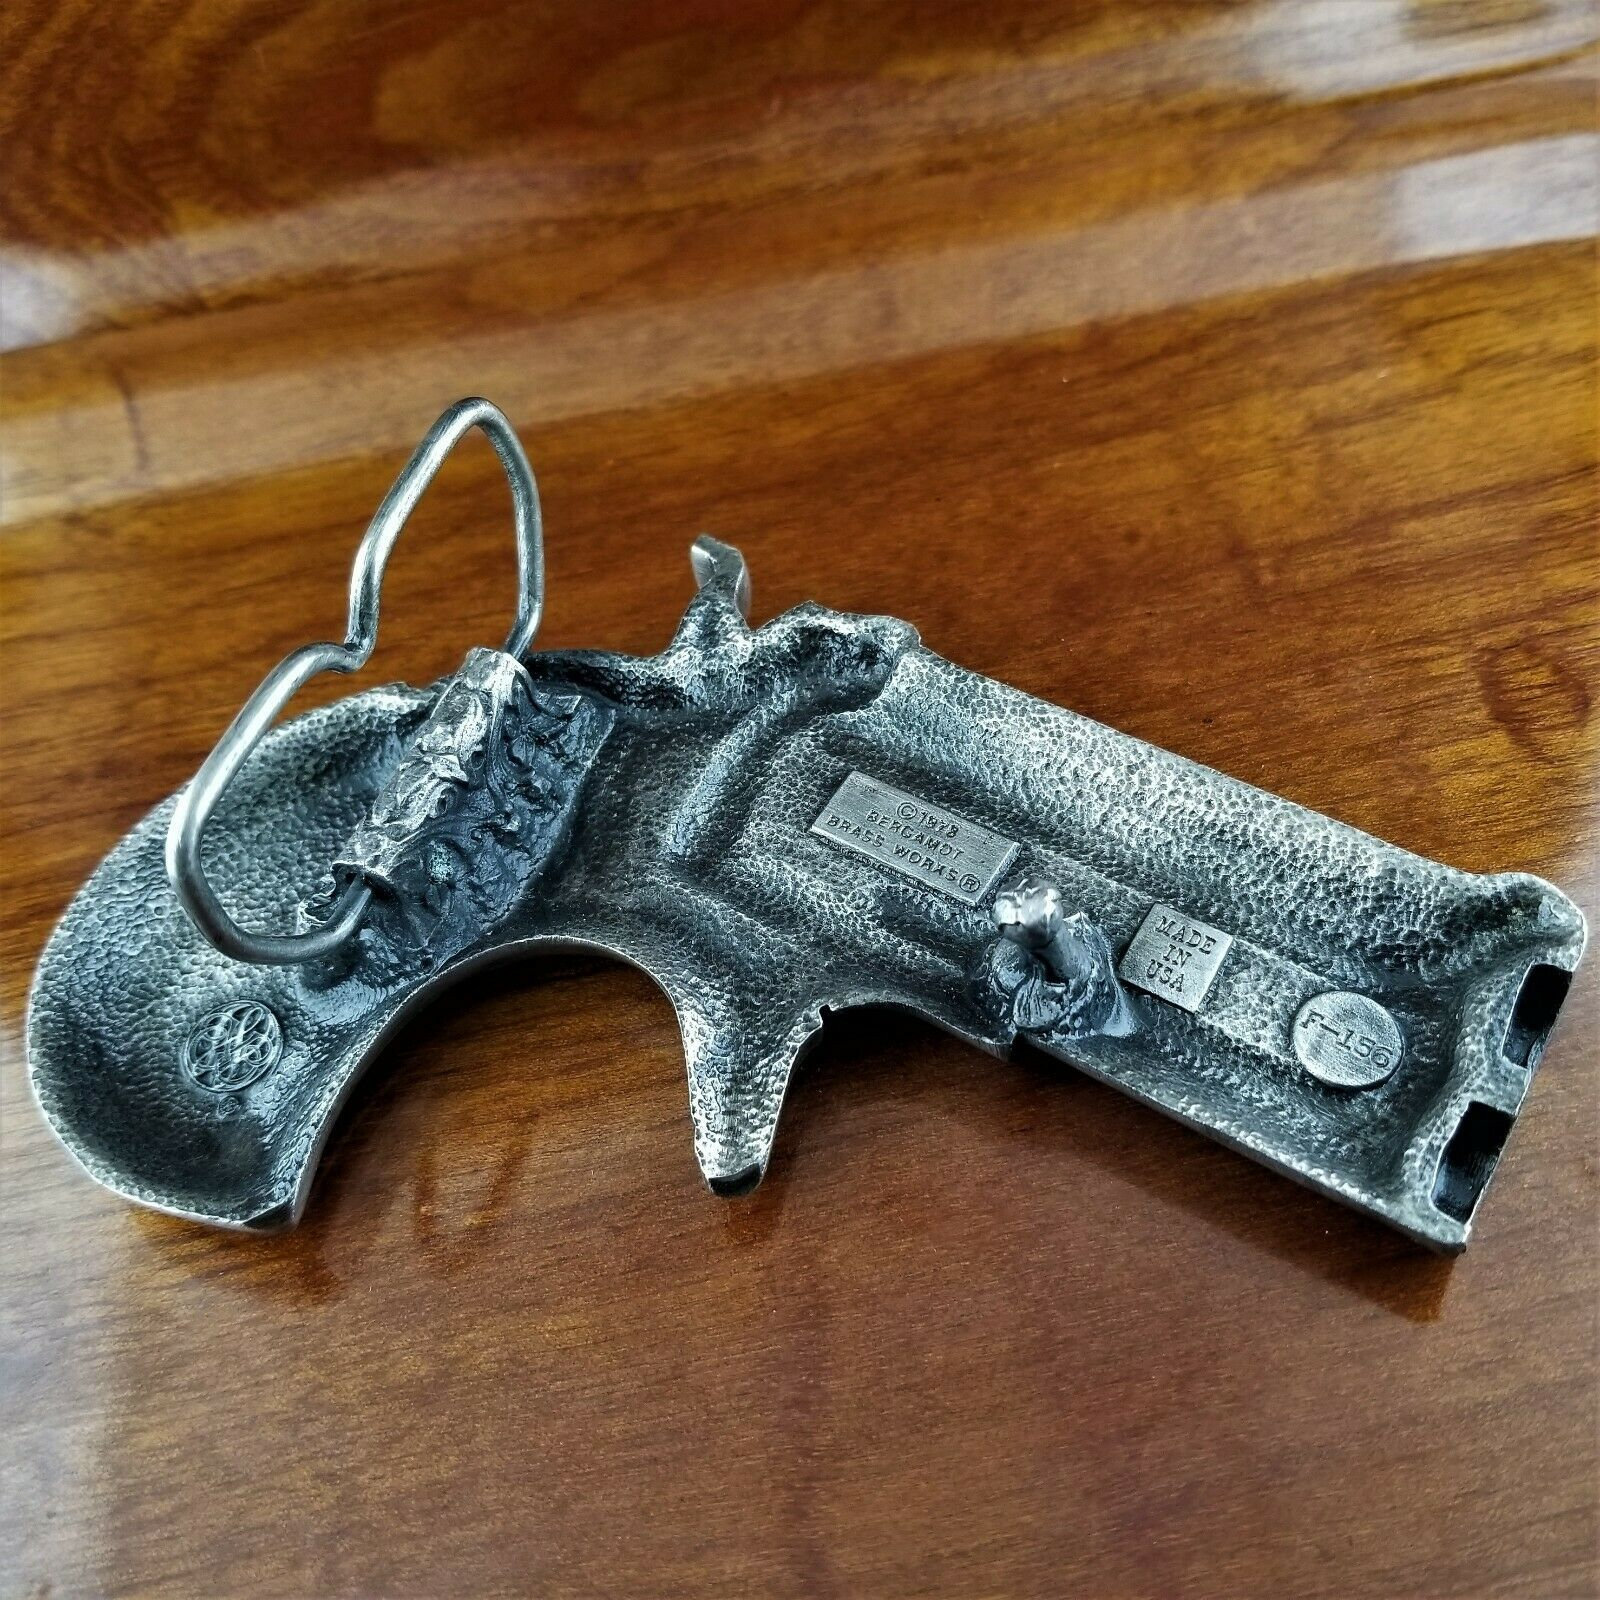 Vintage 1978 Bergamot Brass Works F-156 Derringer Hand Gun Pistol Belt Buckle image 4